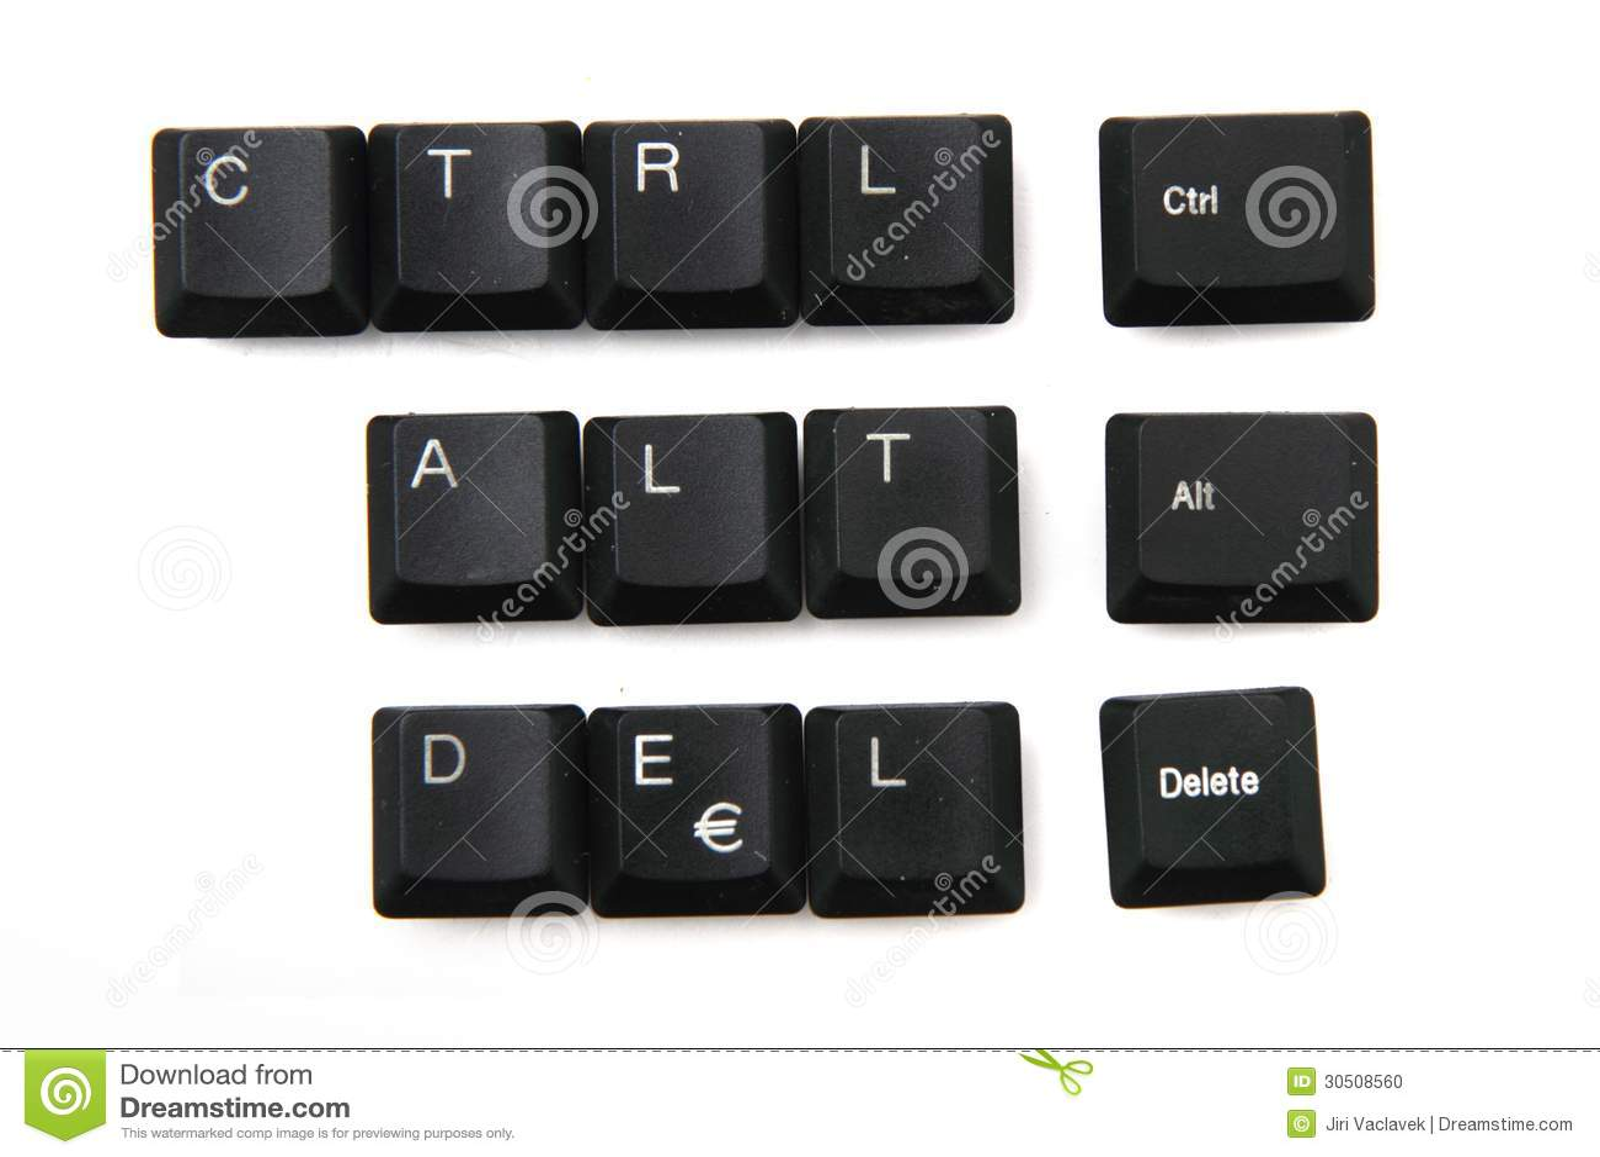 Ctrl alt delete from keyboar keys isolated on the white background